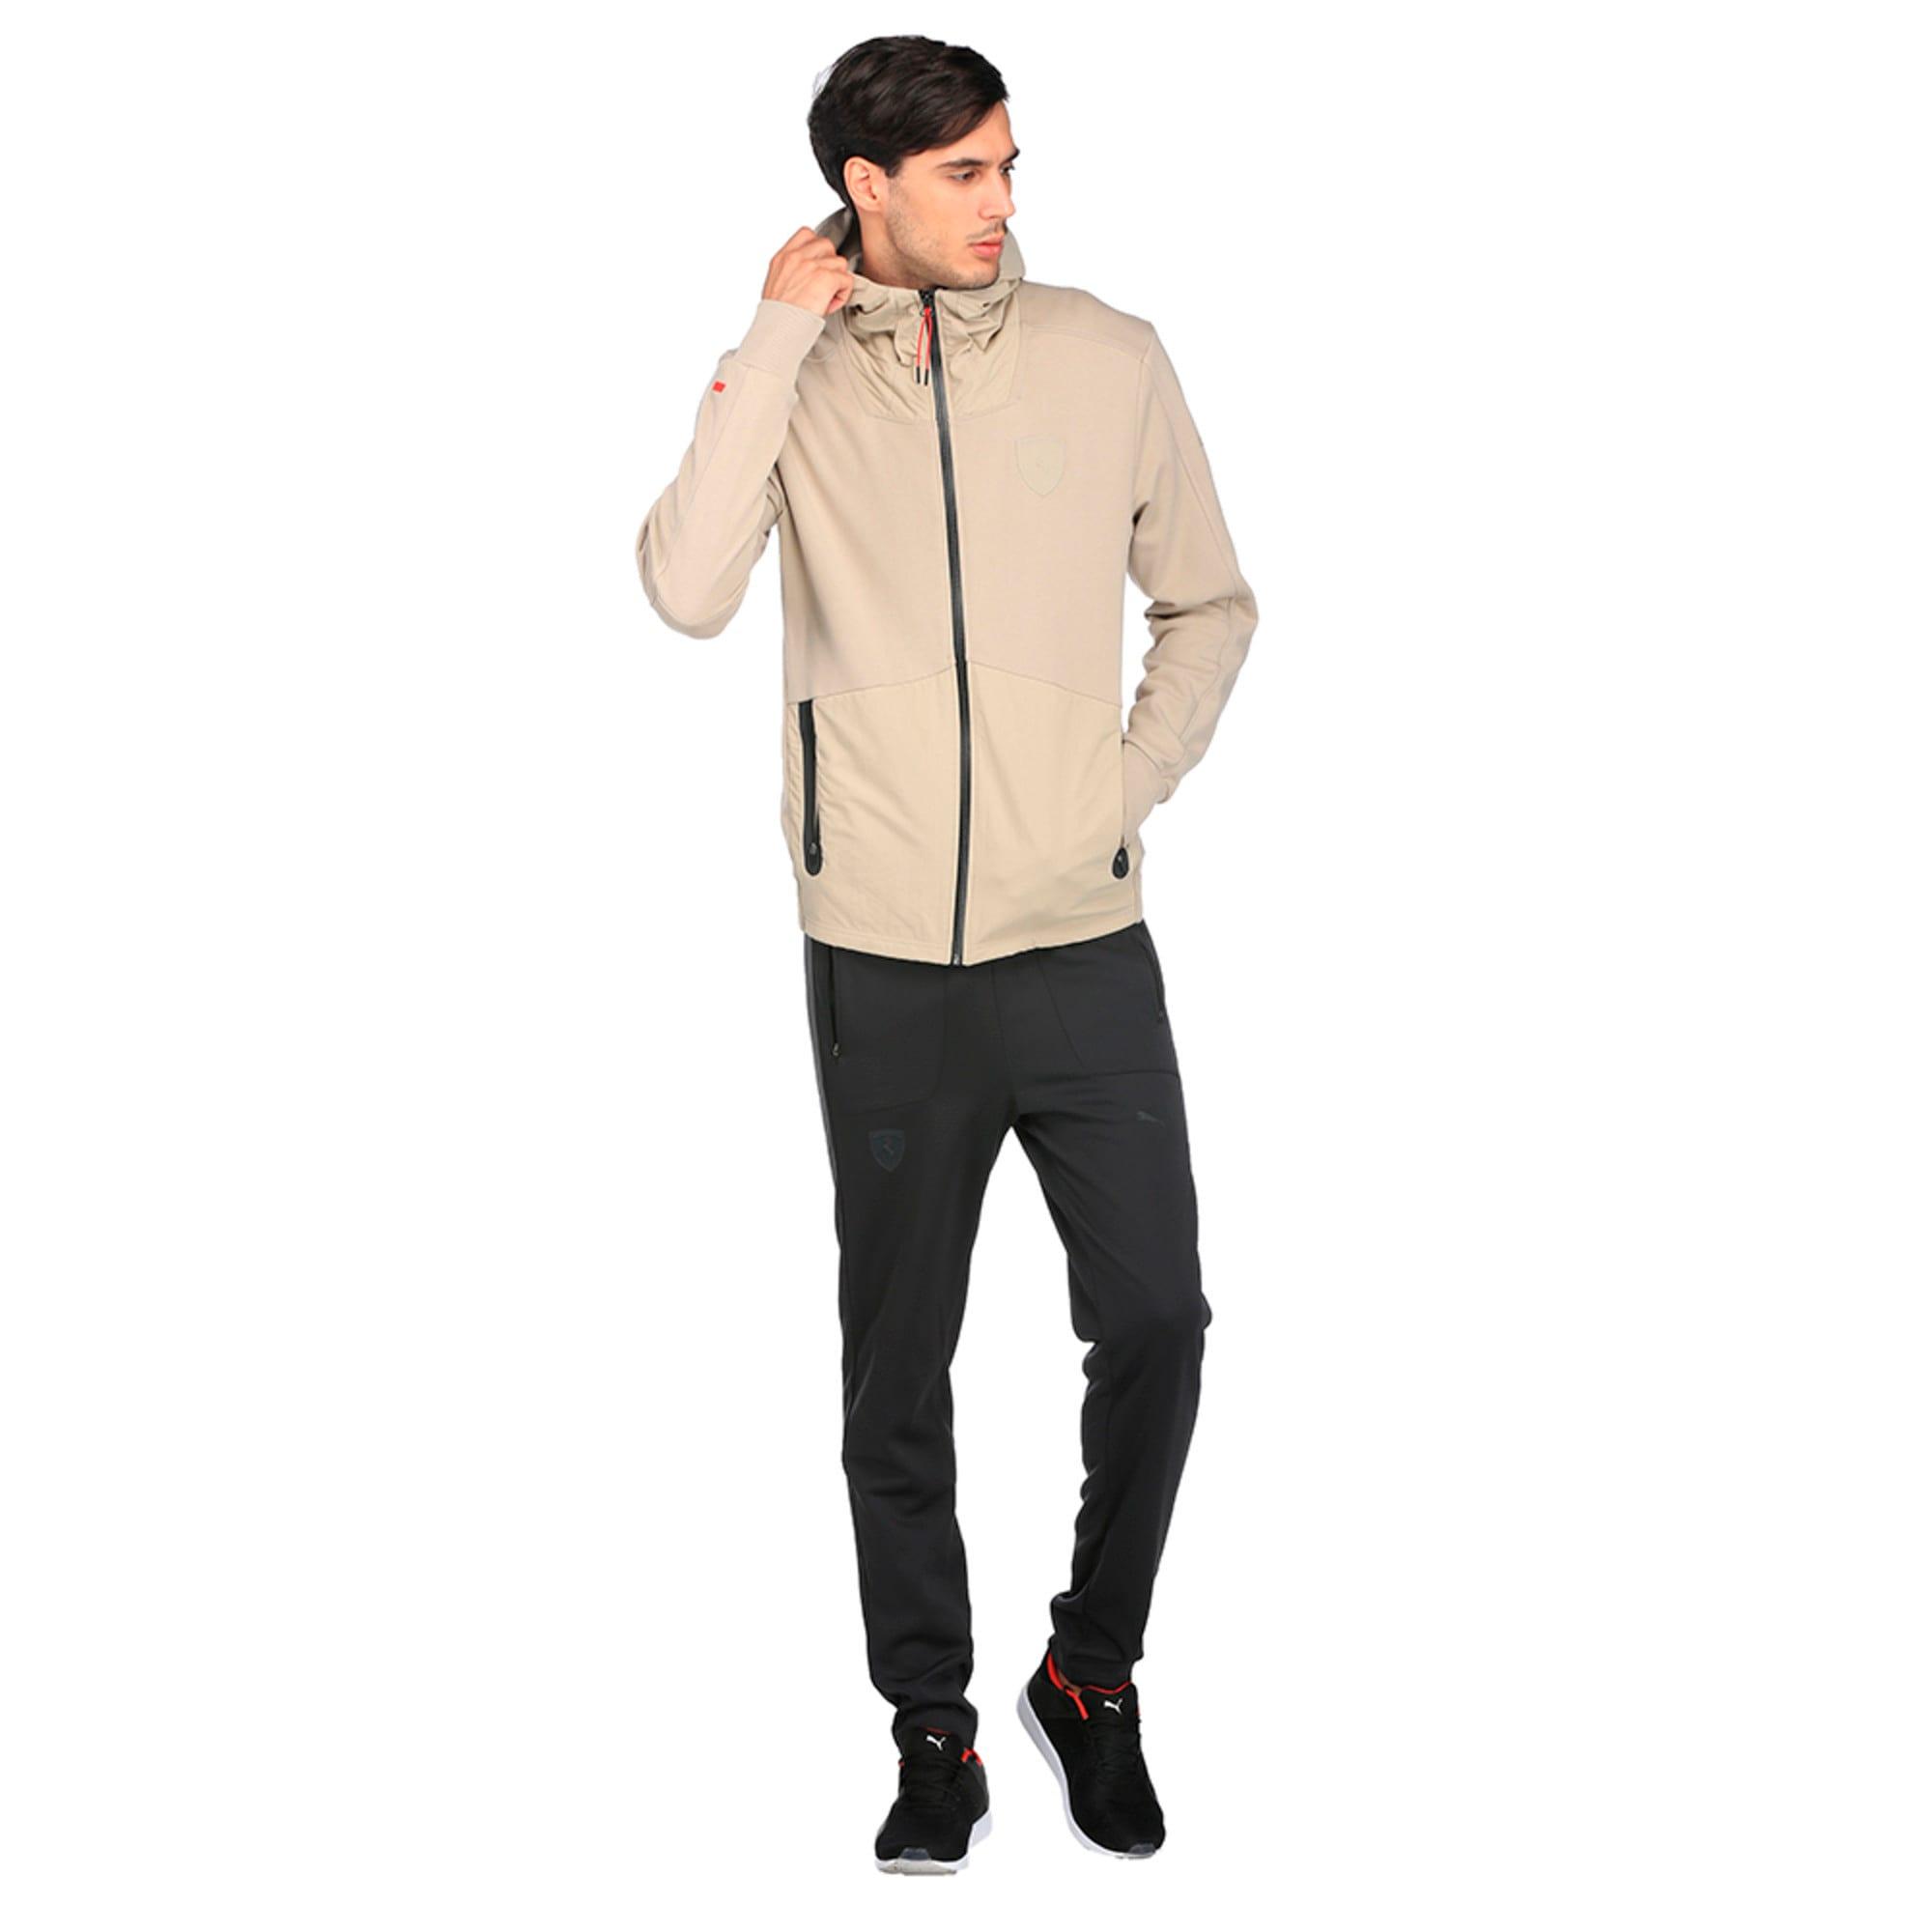 Thumbnail 4 of Ferrari Lifestyle Men's Hooded Sweat Jacket, Pure Cashmere, medium-IND